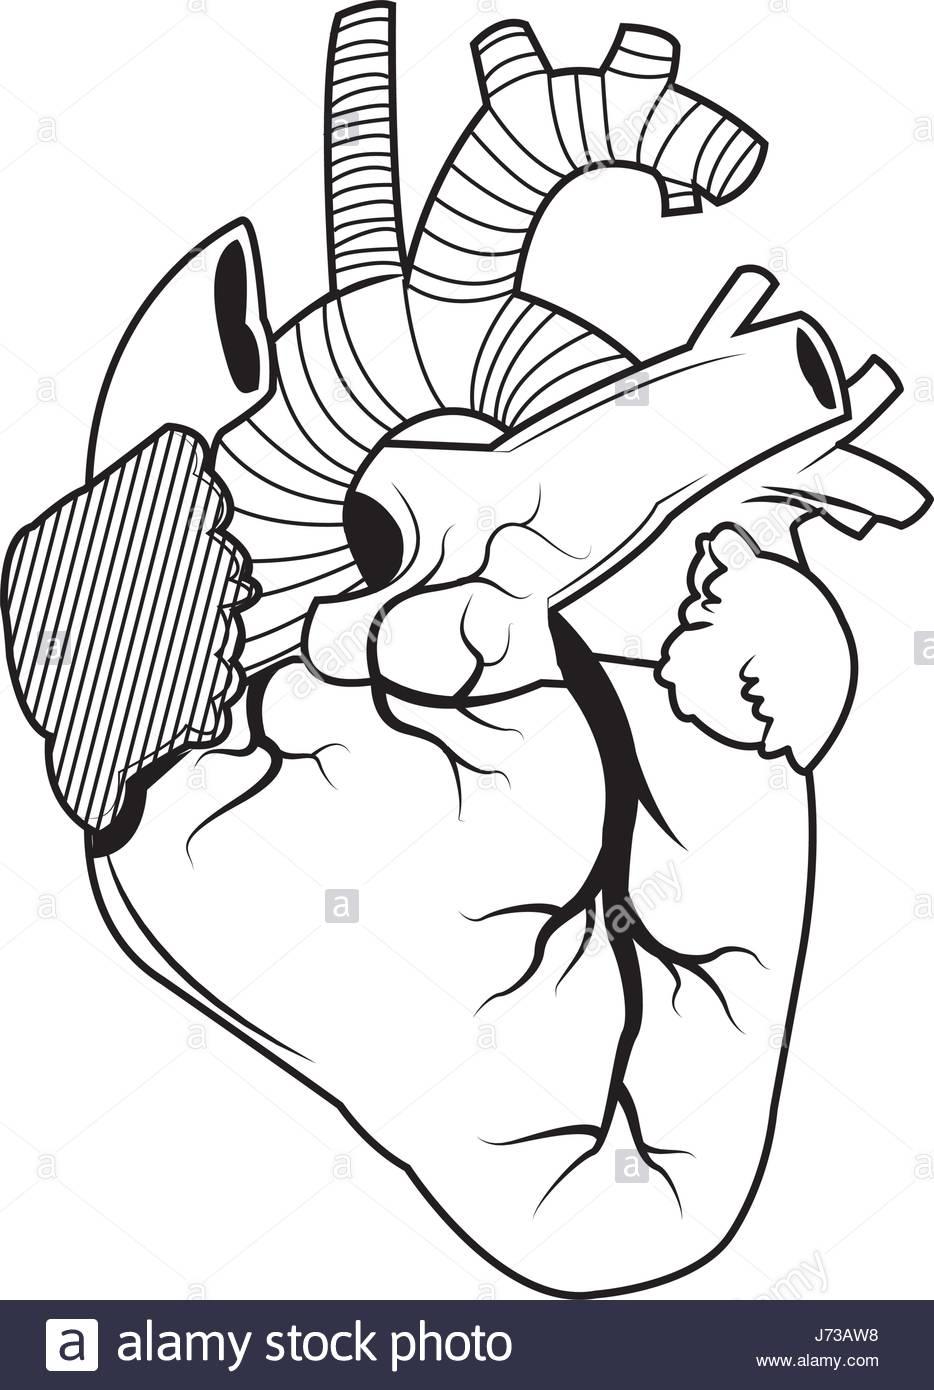 934x1390 Human Heart